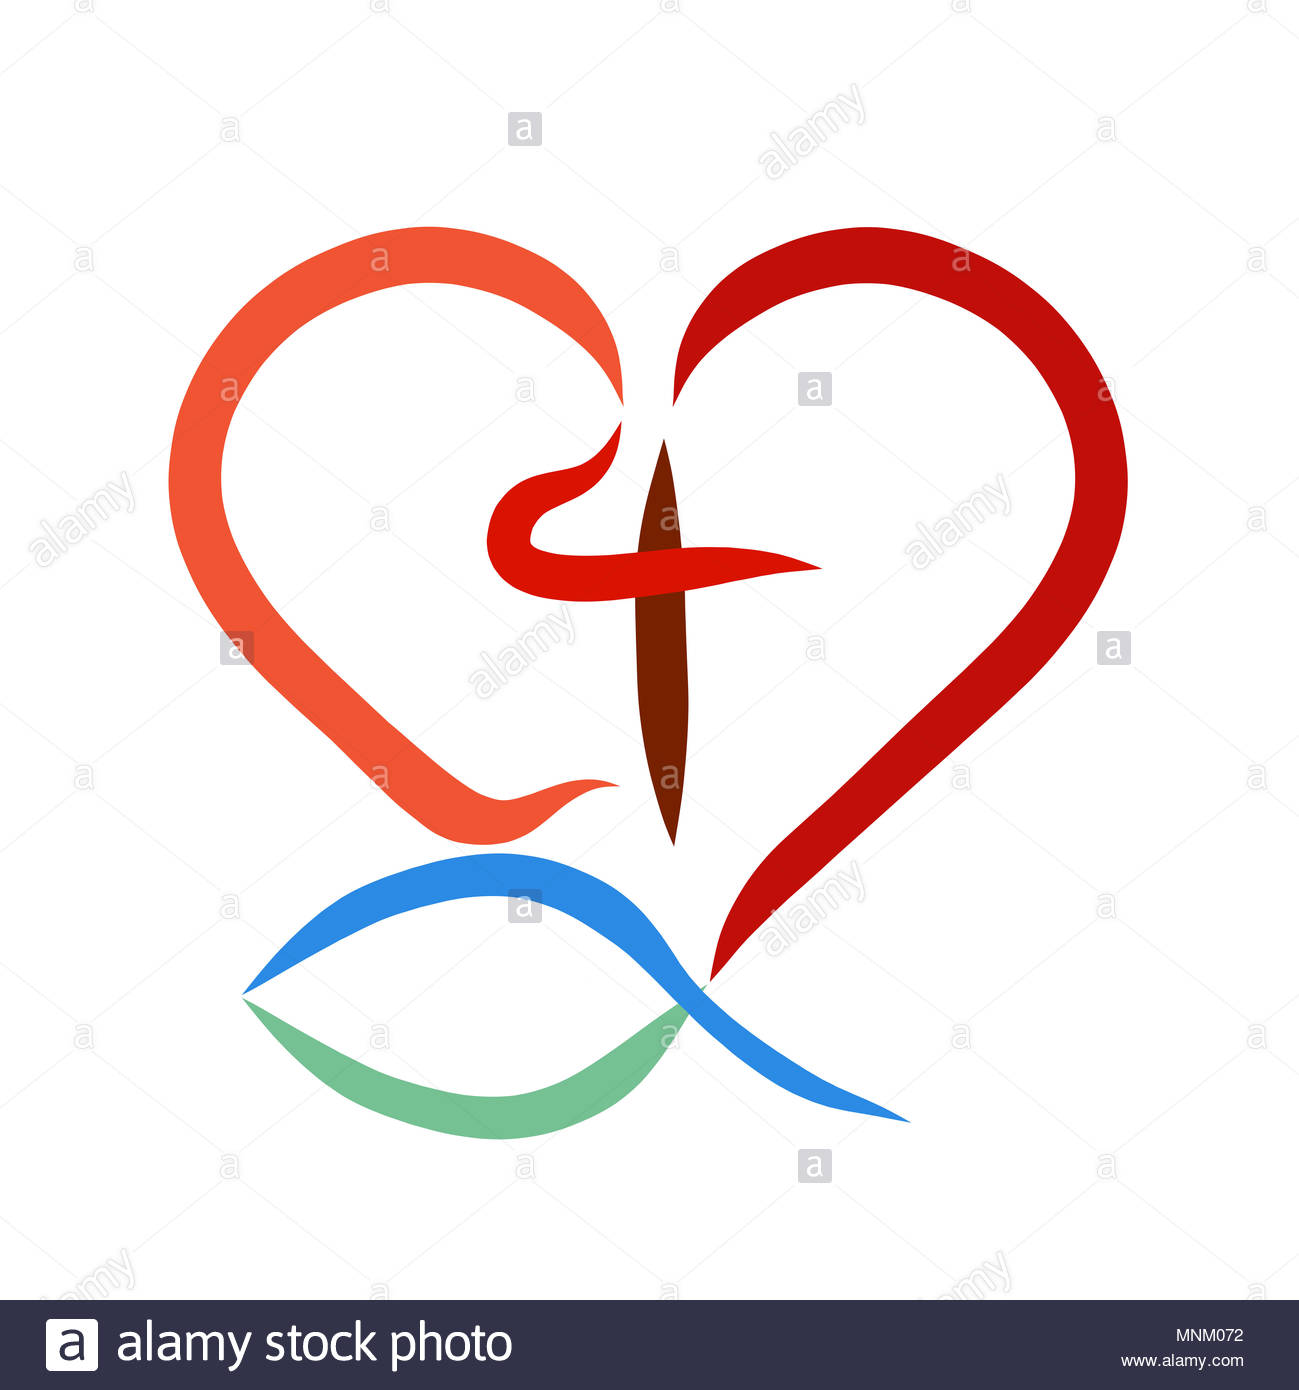 Heart Cross And Fish Christian Symbols Stock Photo 185450694 Alamy